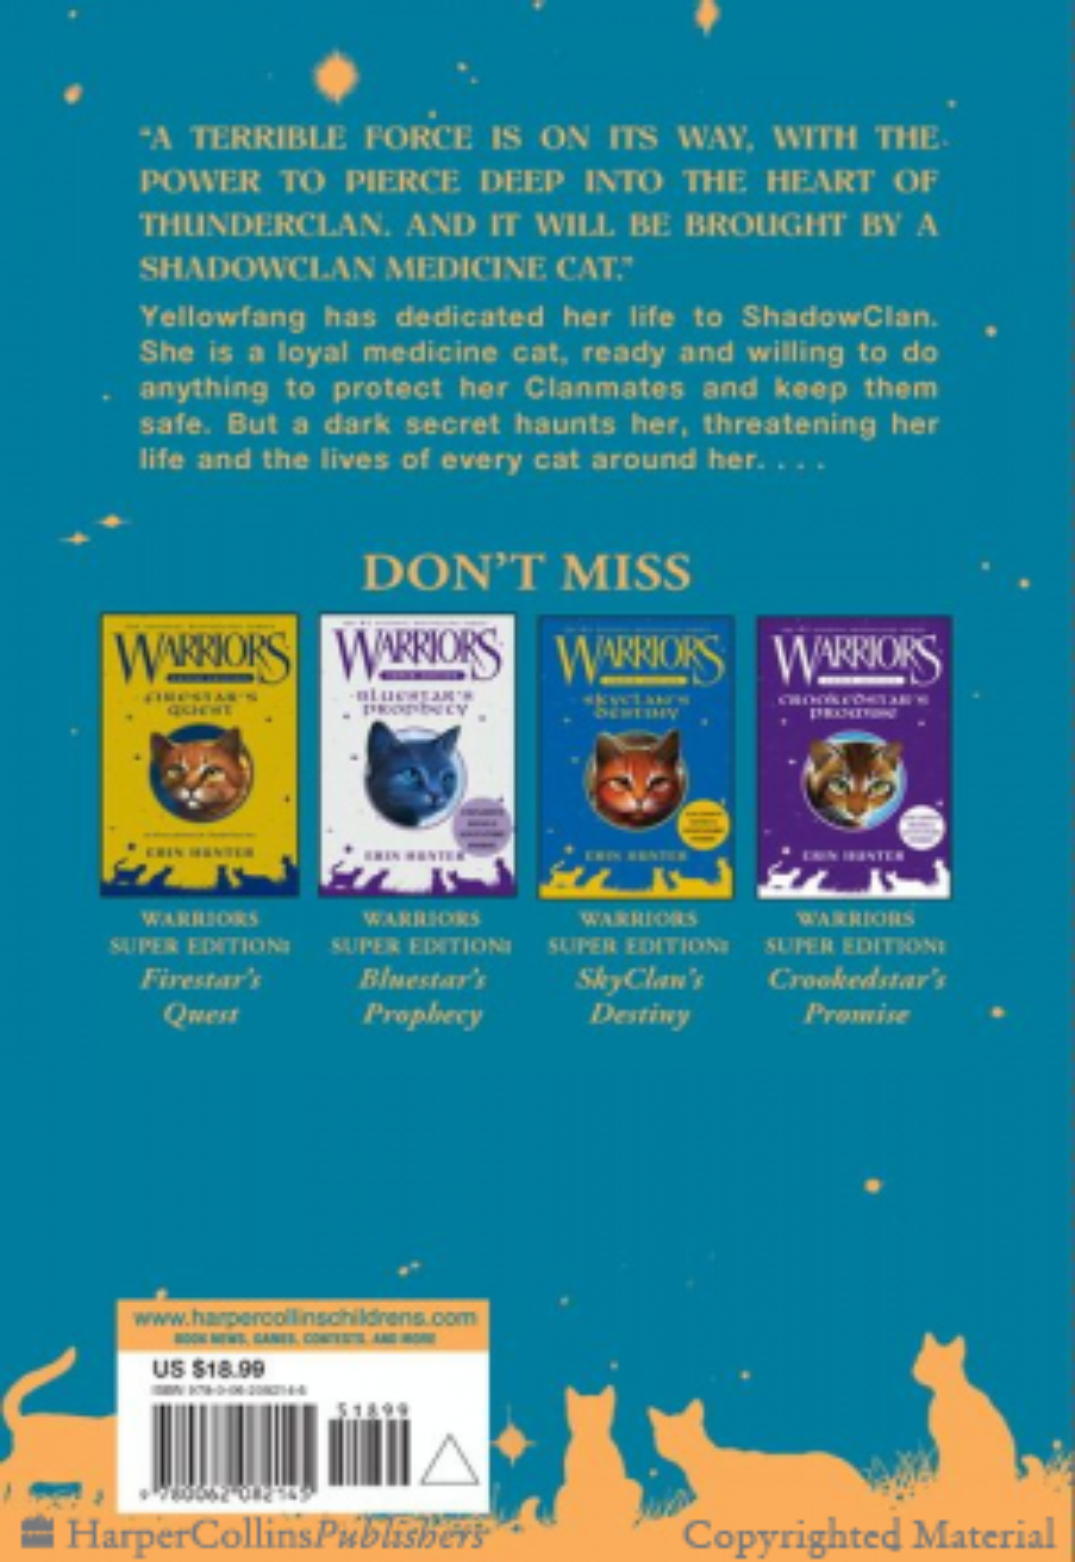 Yellowfang's Secret | Warriors Wiki | FANDOM powered by Wikia